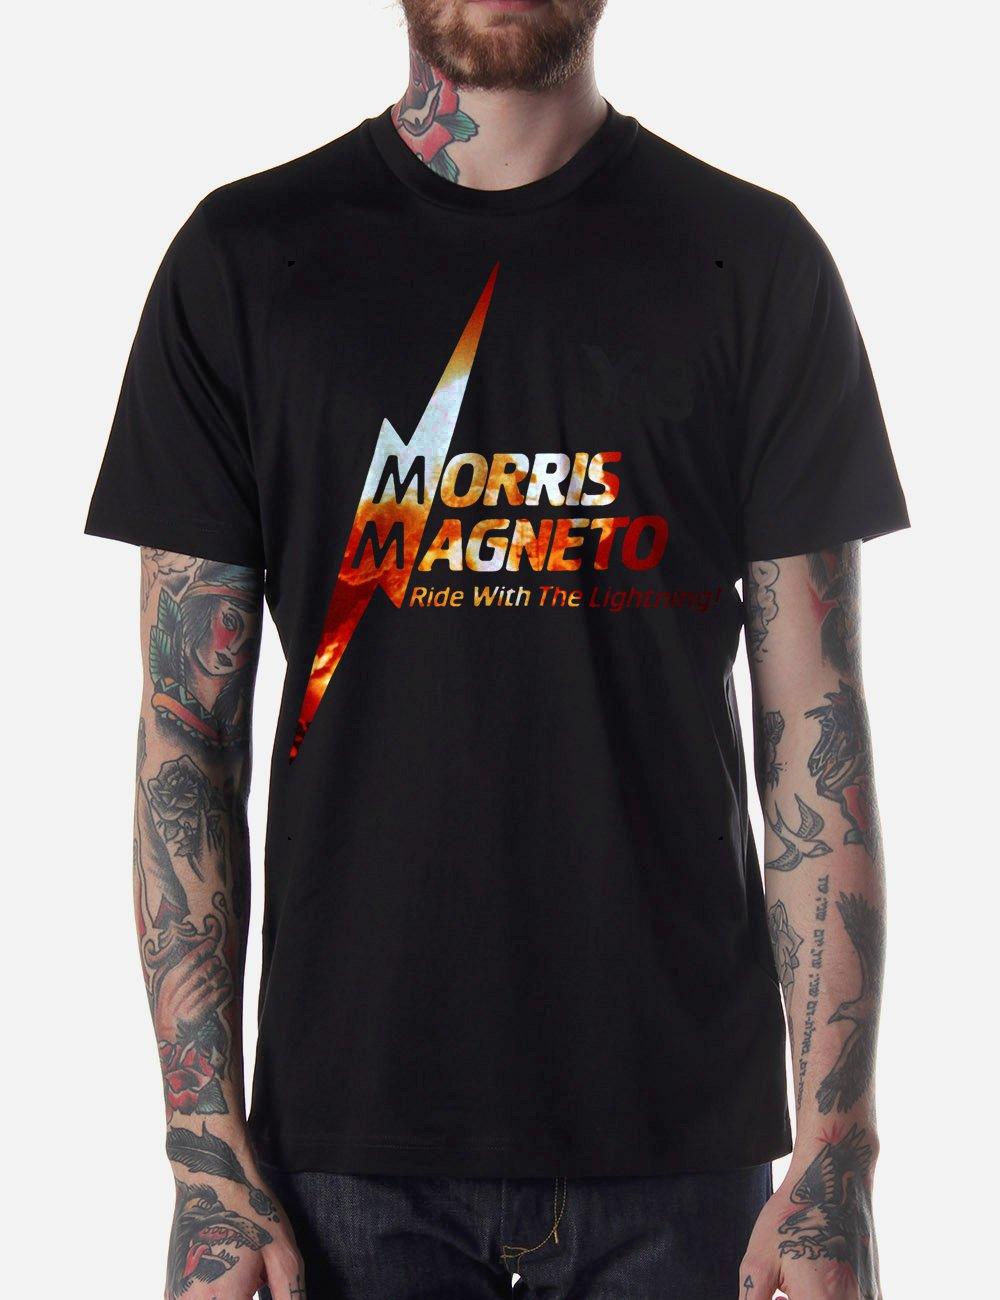 Black Men Tshirt MORRIS MAGNETOS BOLT Black Tshirt For Men